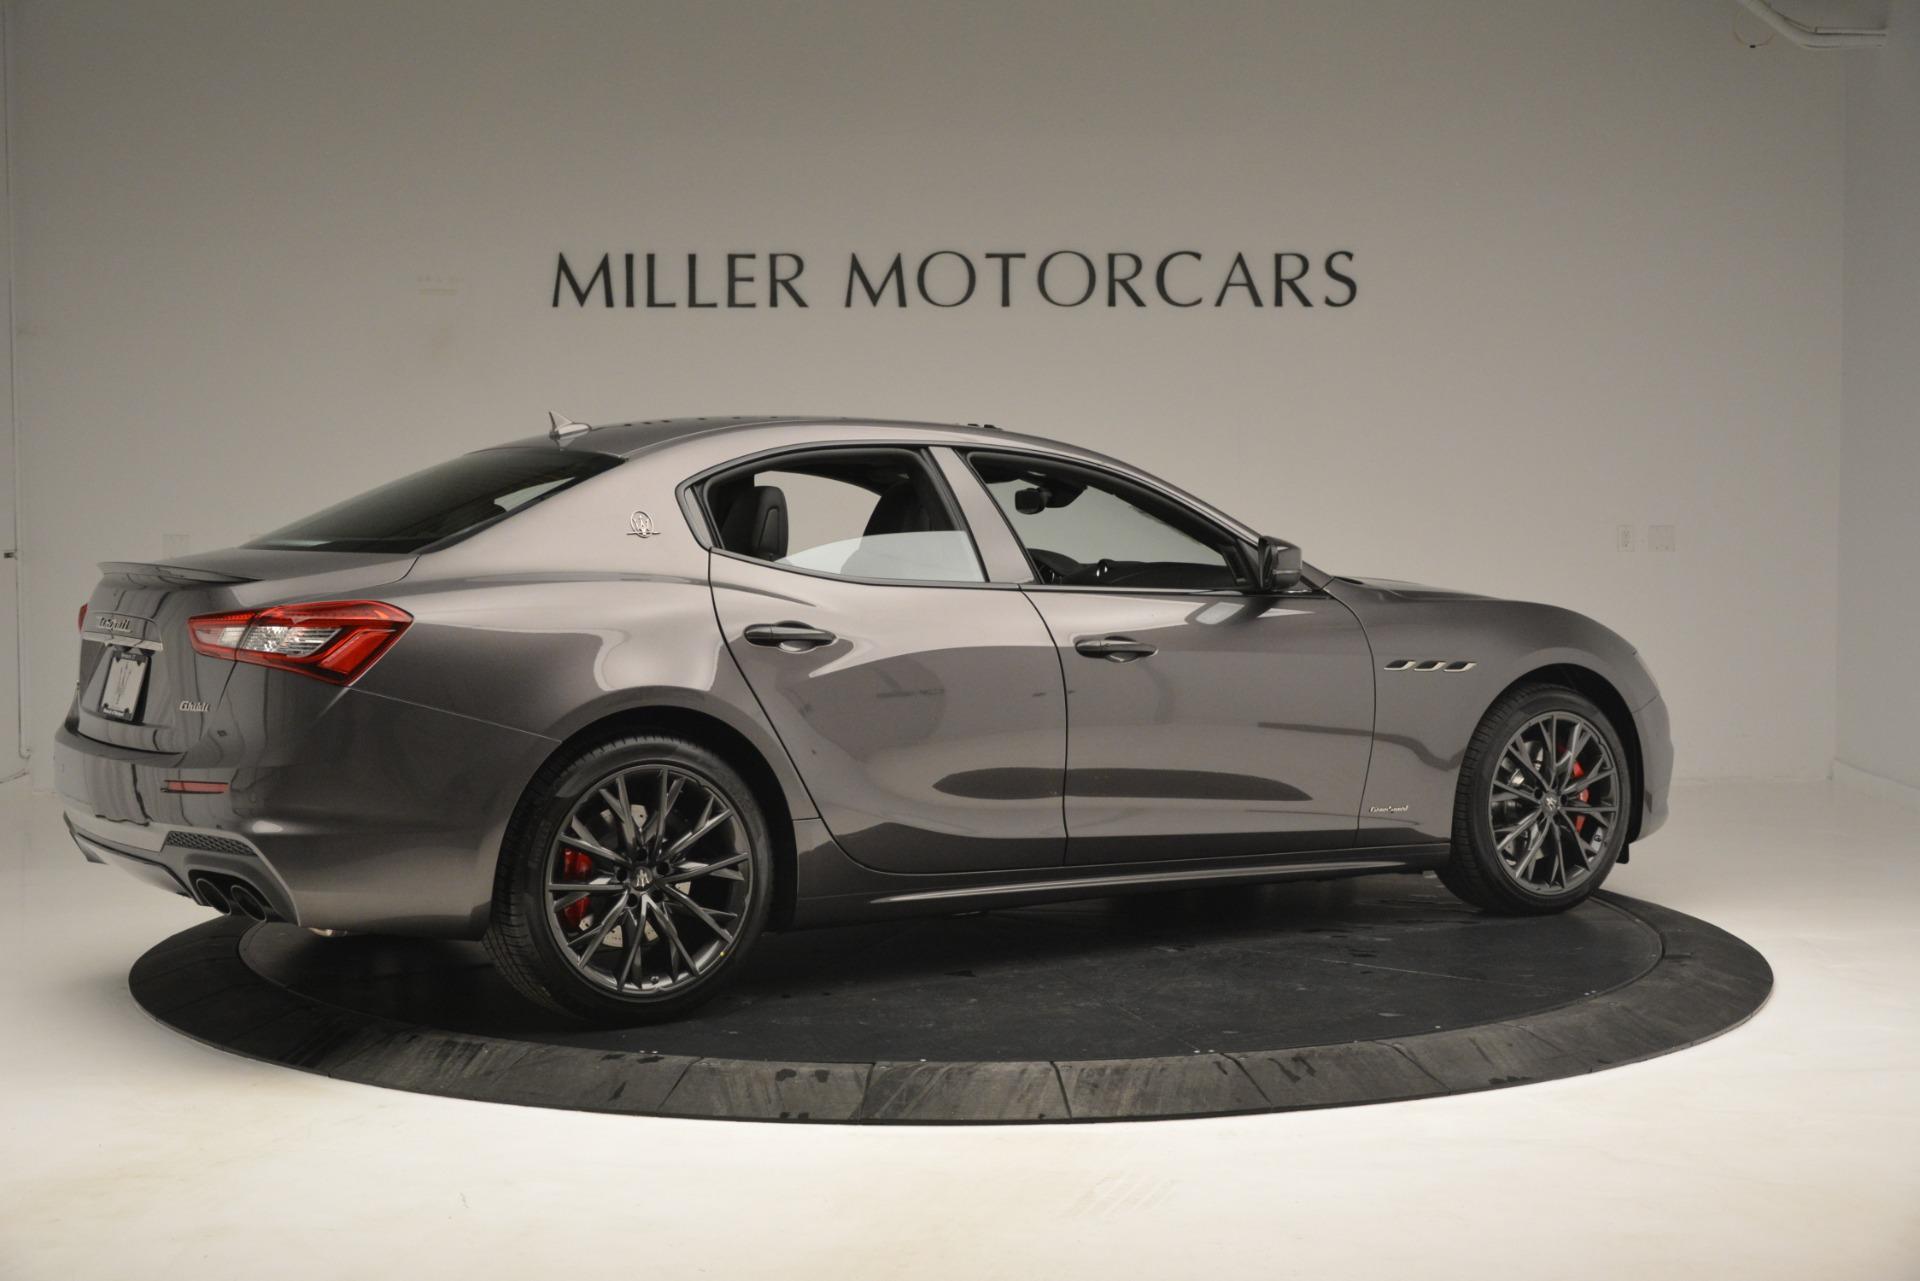 New 2019 Maserati Ghibli S Q4 GranSport For Sale In Westport, CT 2925_p9